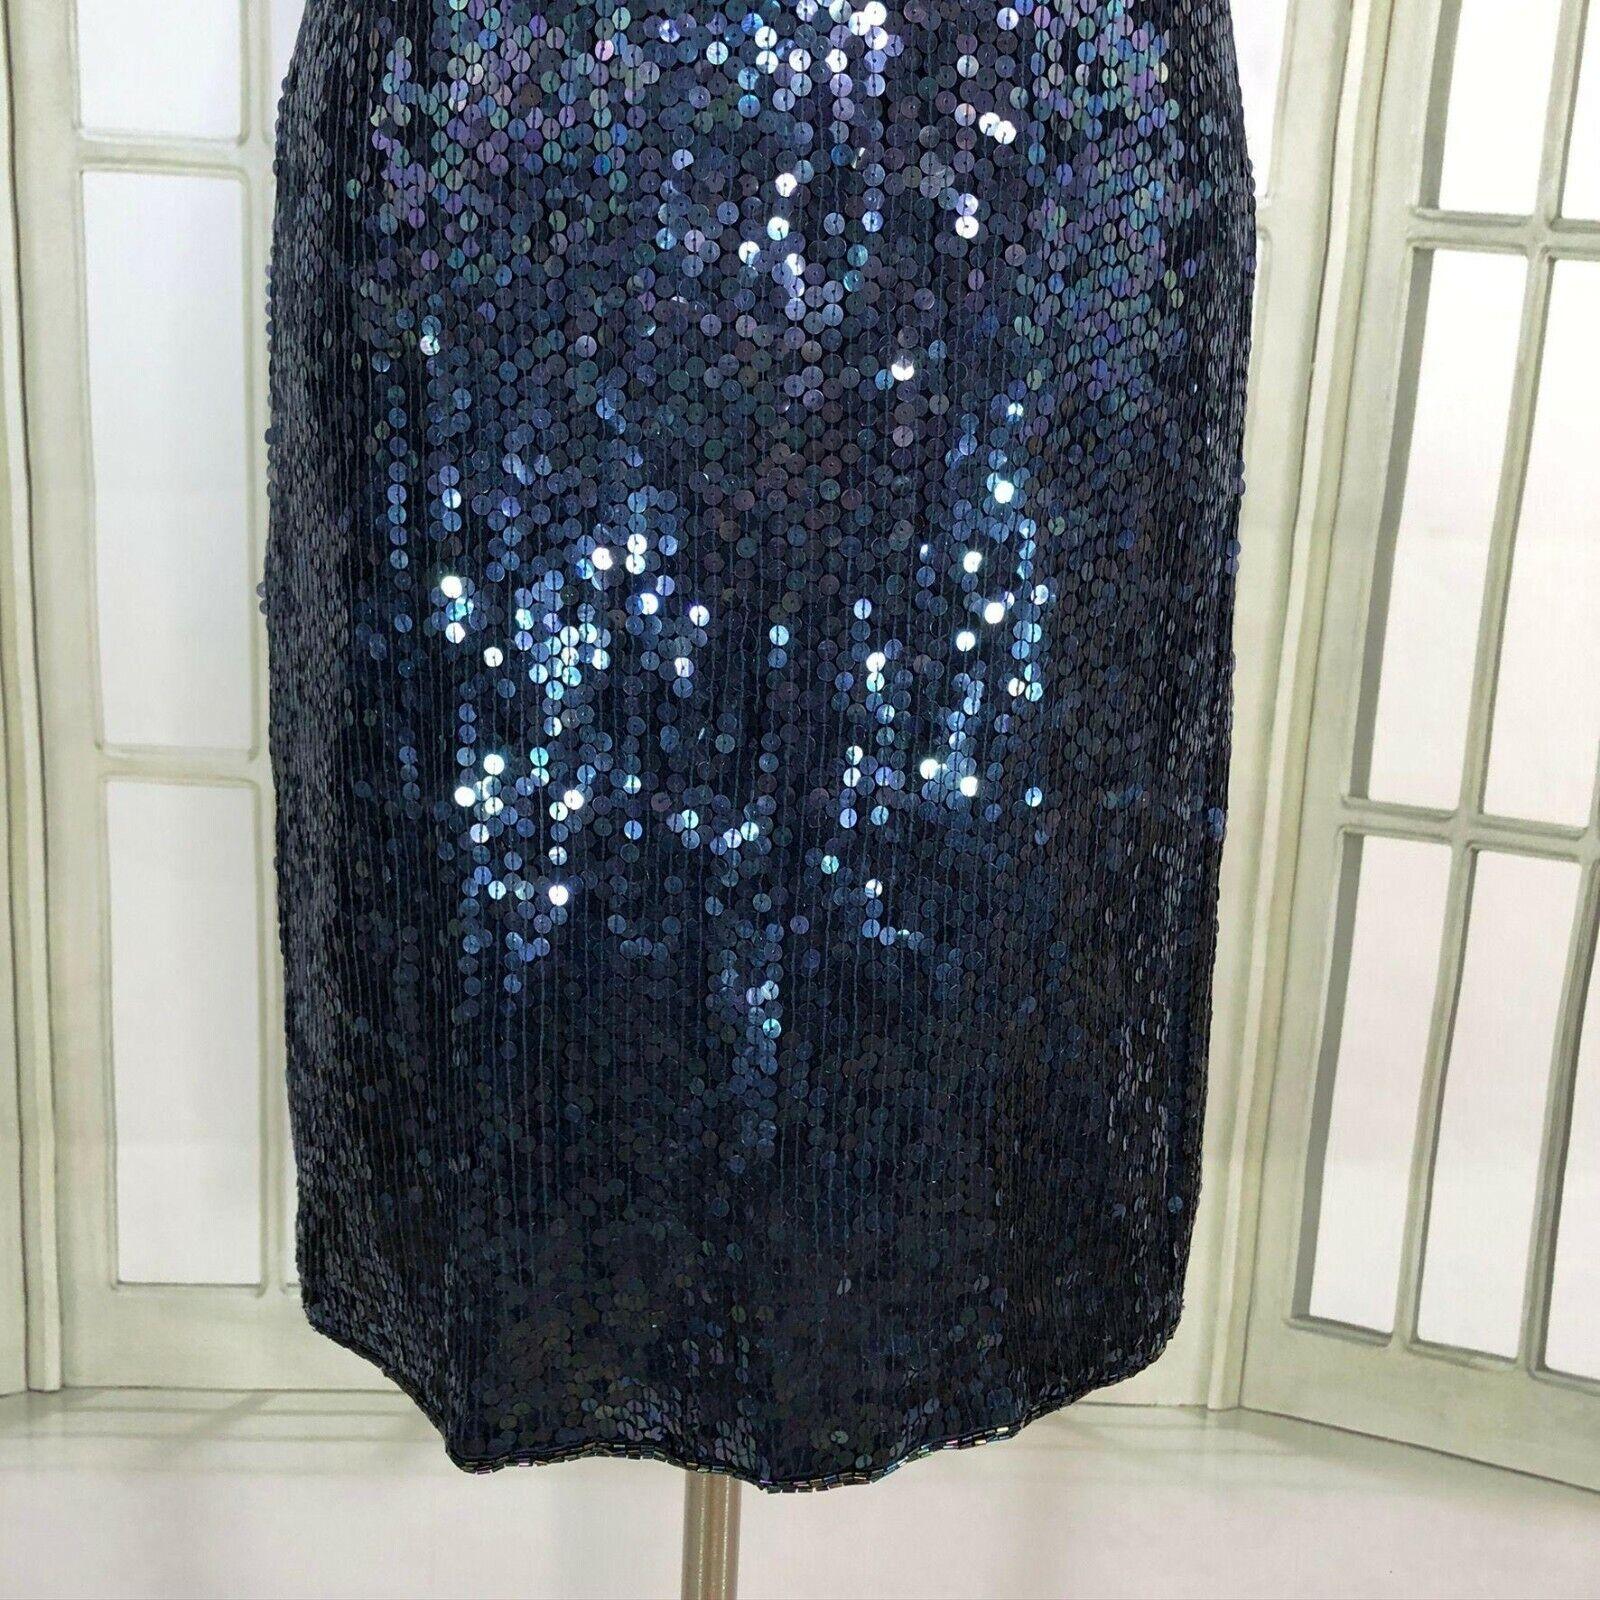 Jewel Queen Sequin Sheath Dress V Neck Size Mediu… - image 6